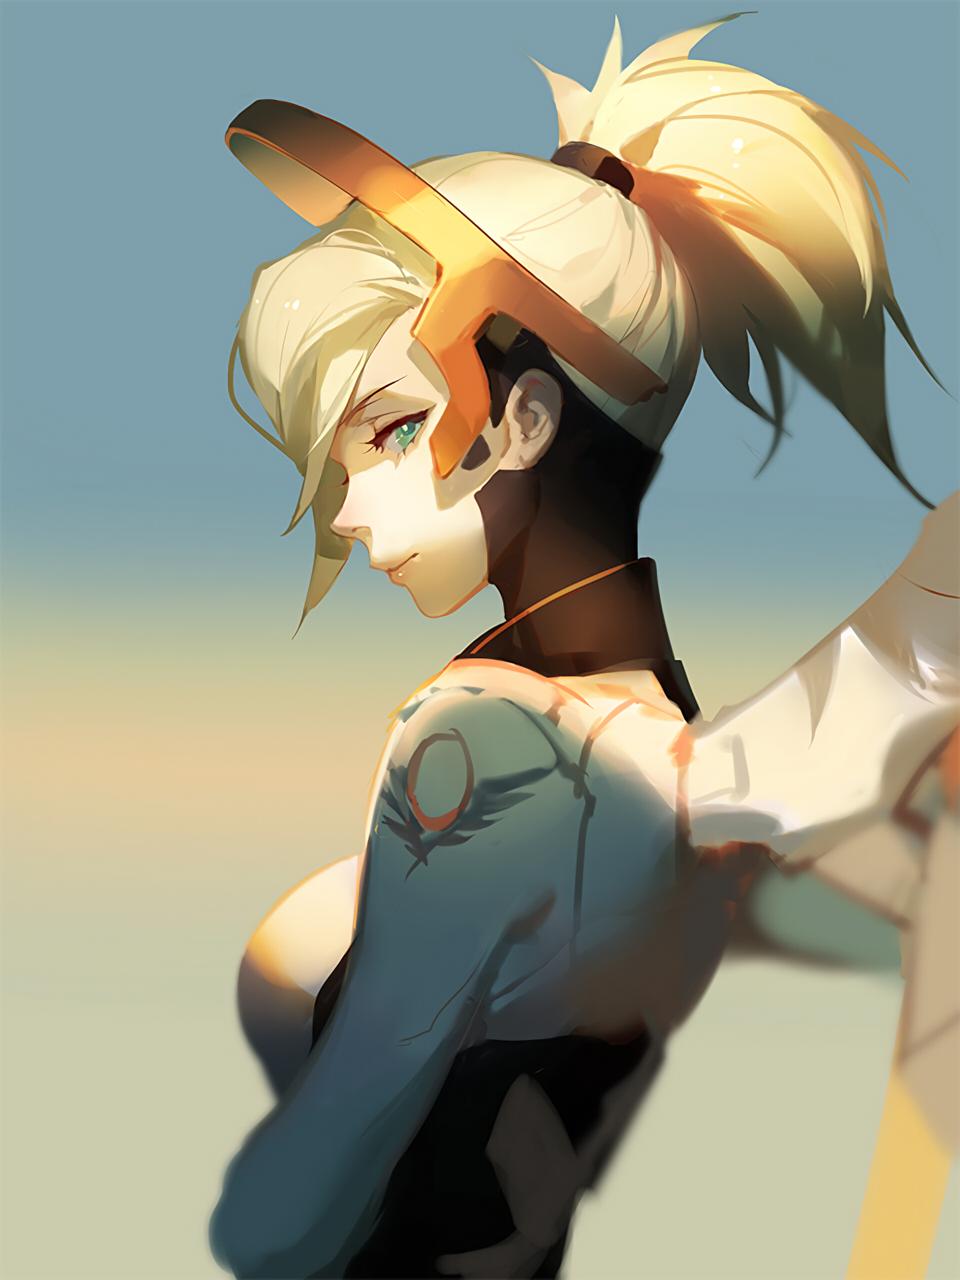 Mercy overwatch overwatch zerochan anime image board for Zerochan anime